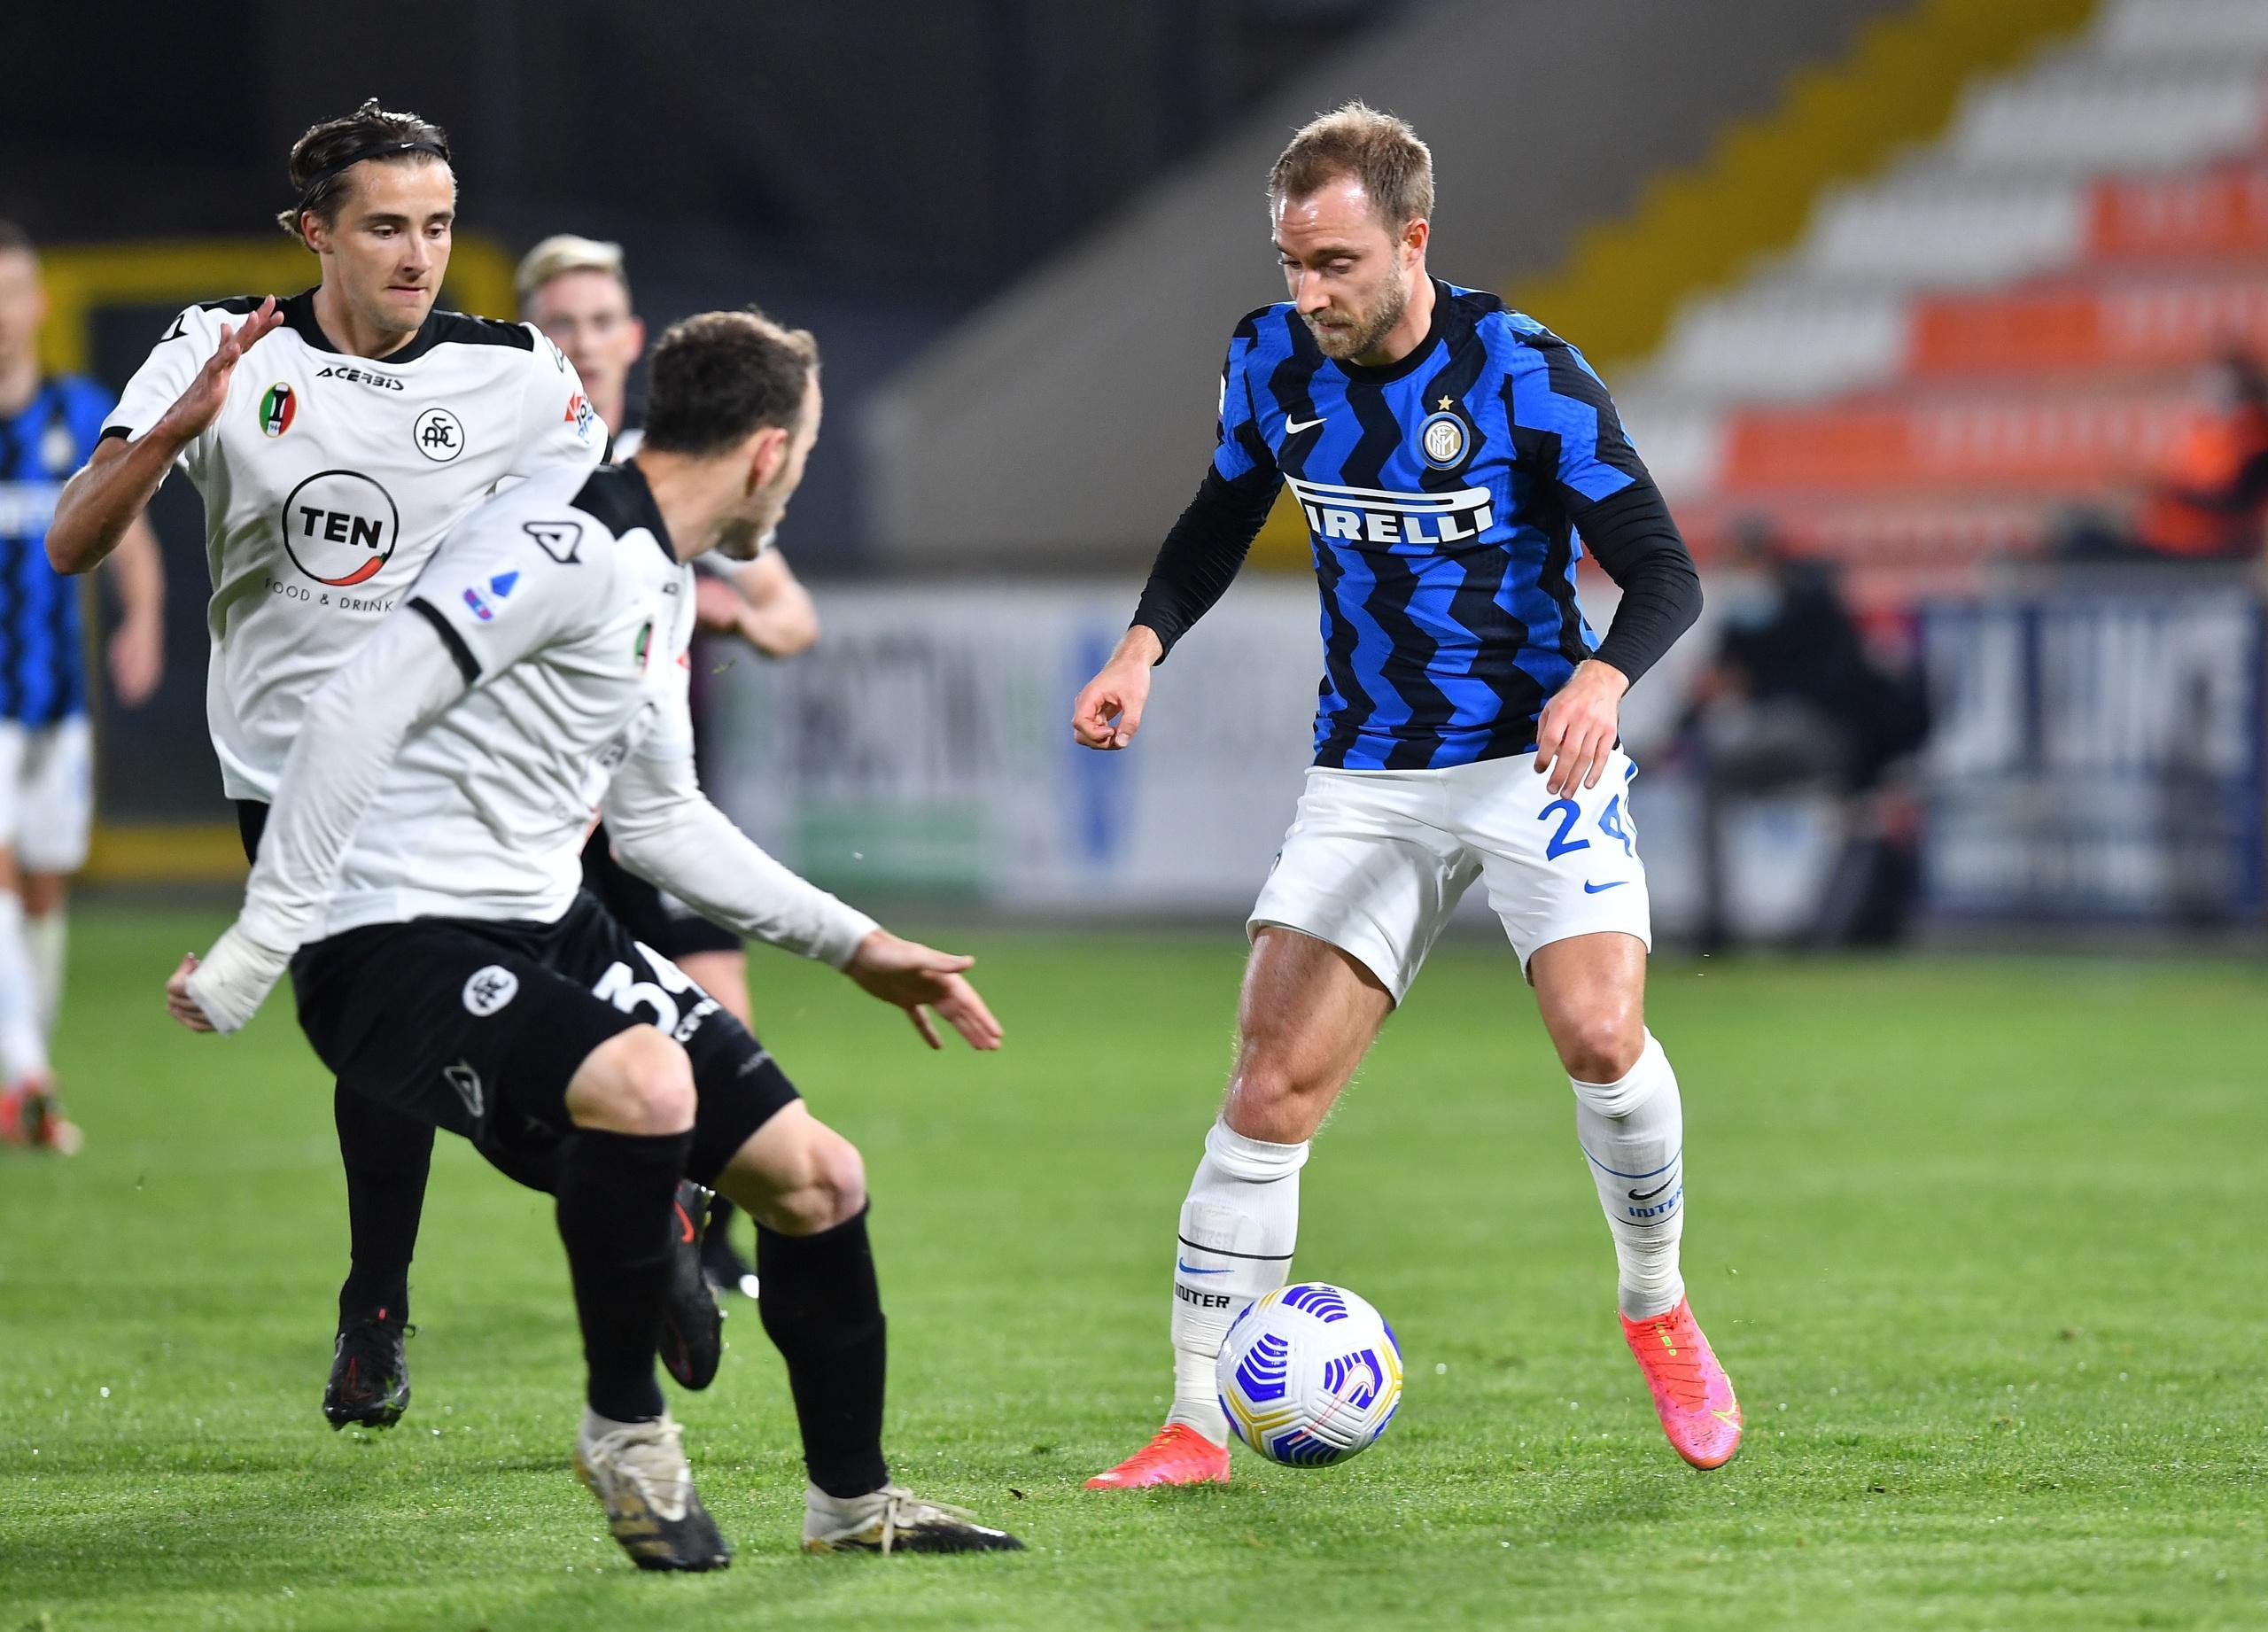 Christian Eriksen kan stoppas från fortsatt spel i Serie A